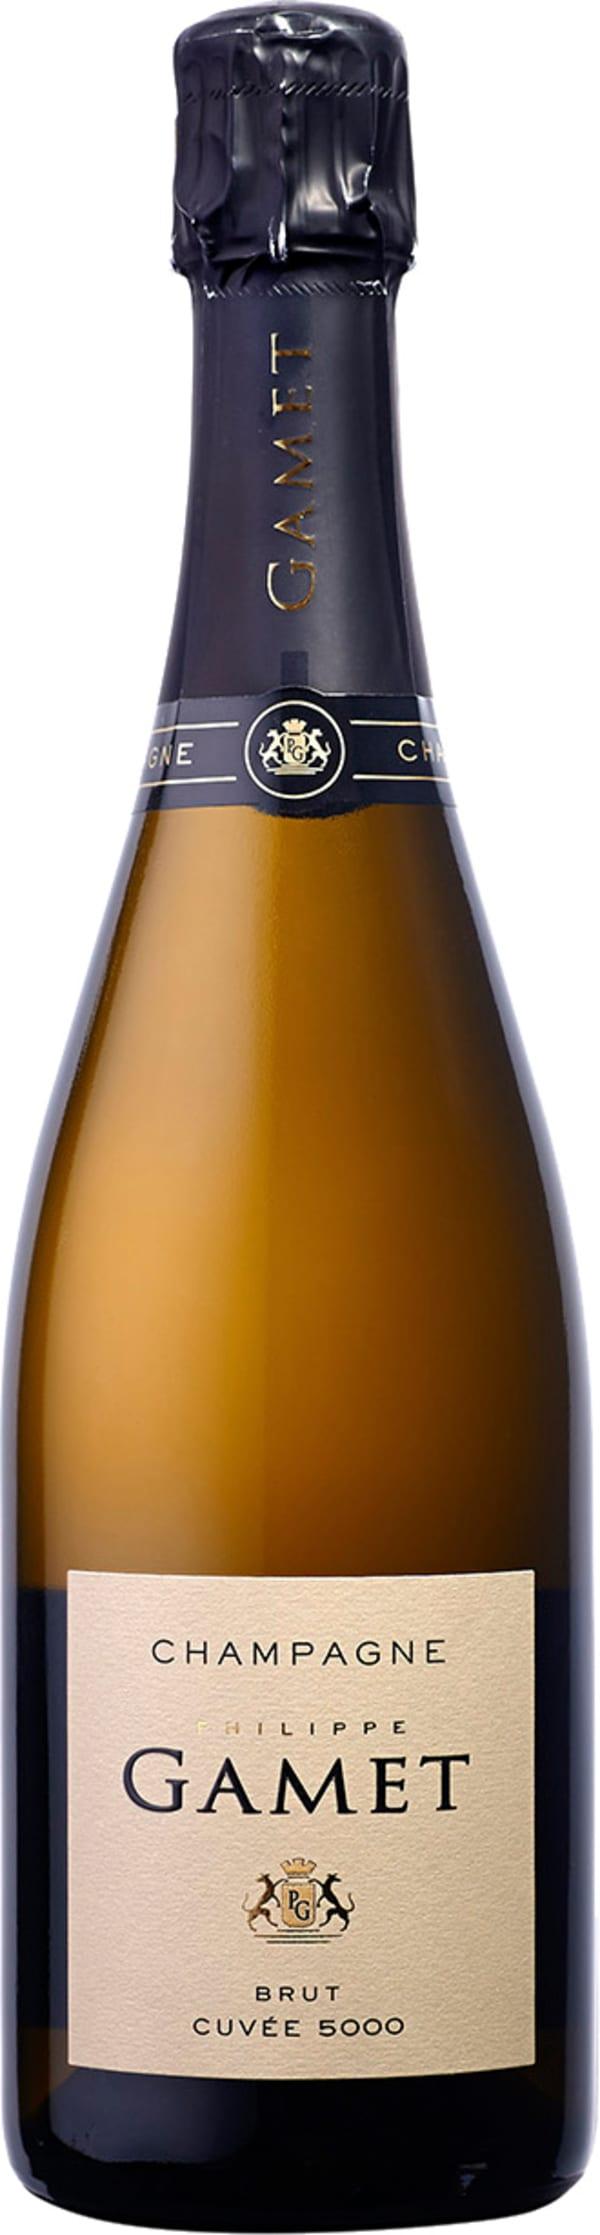 Philippe Gamet Cuvée 5000 Champagne Brut